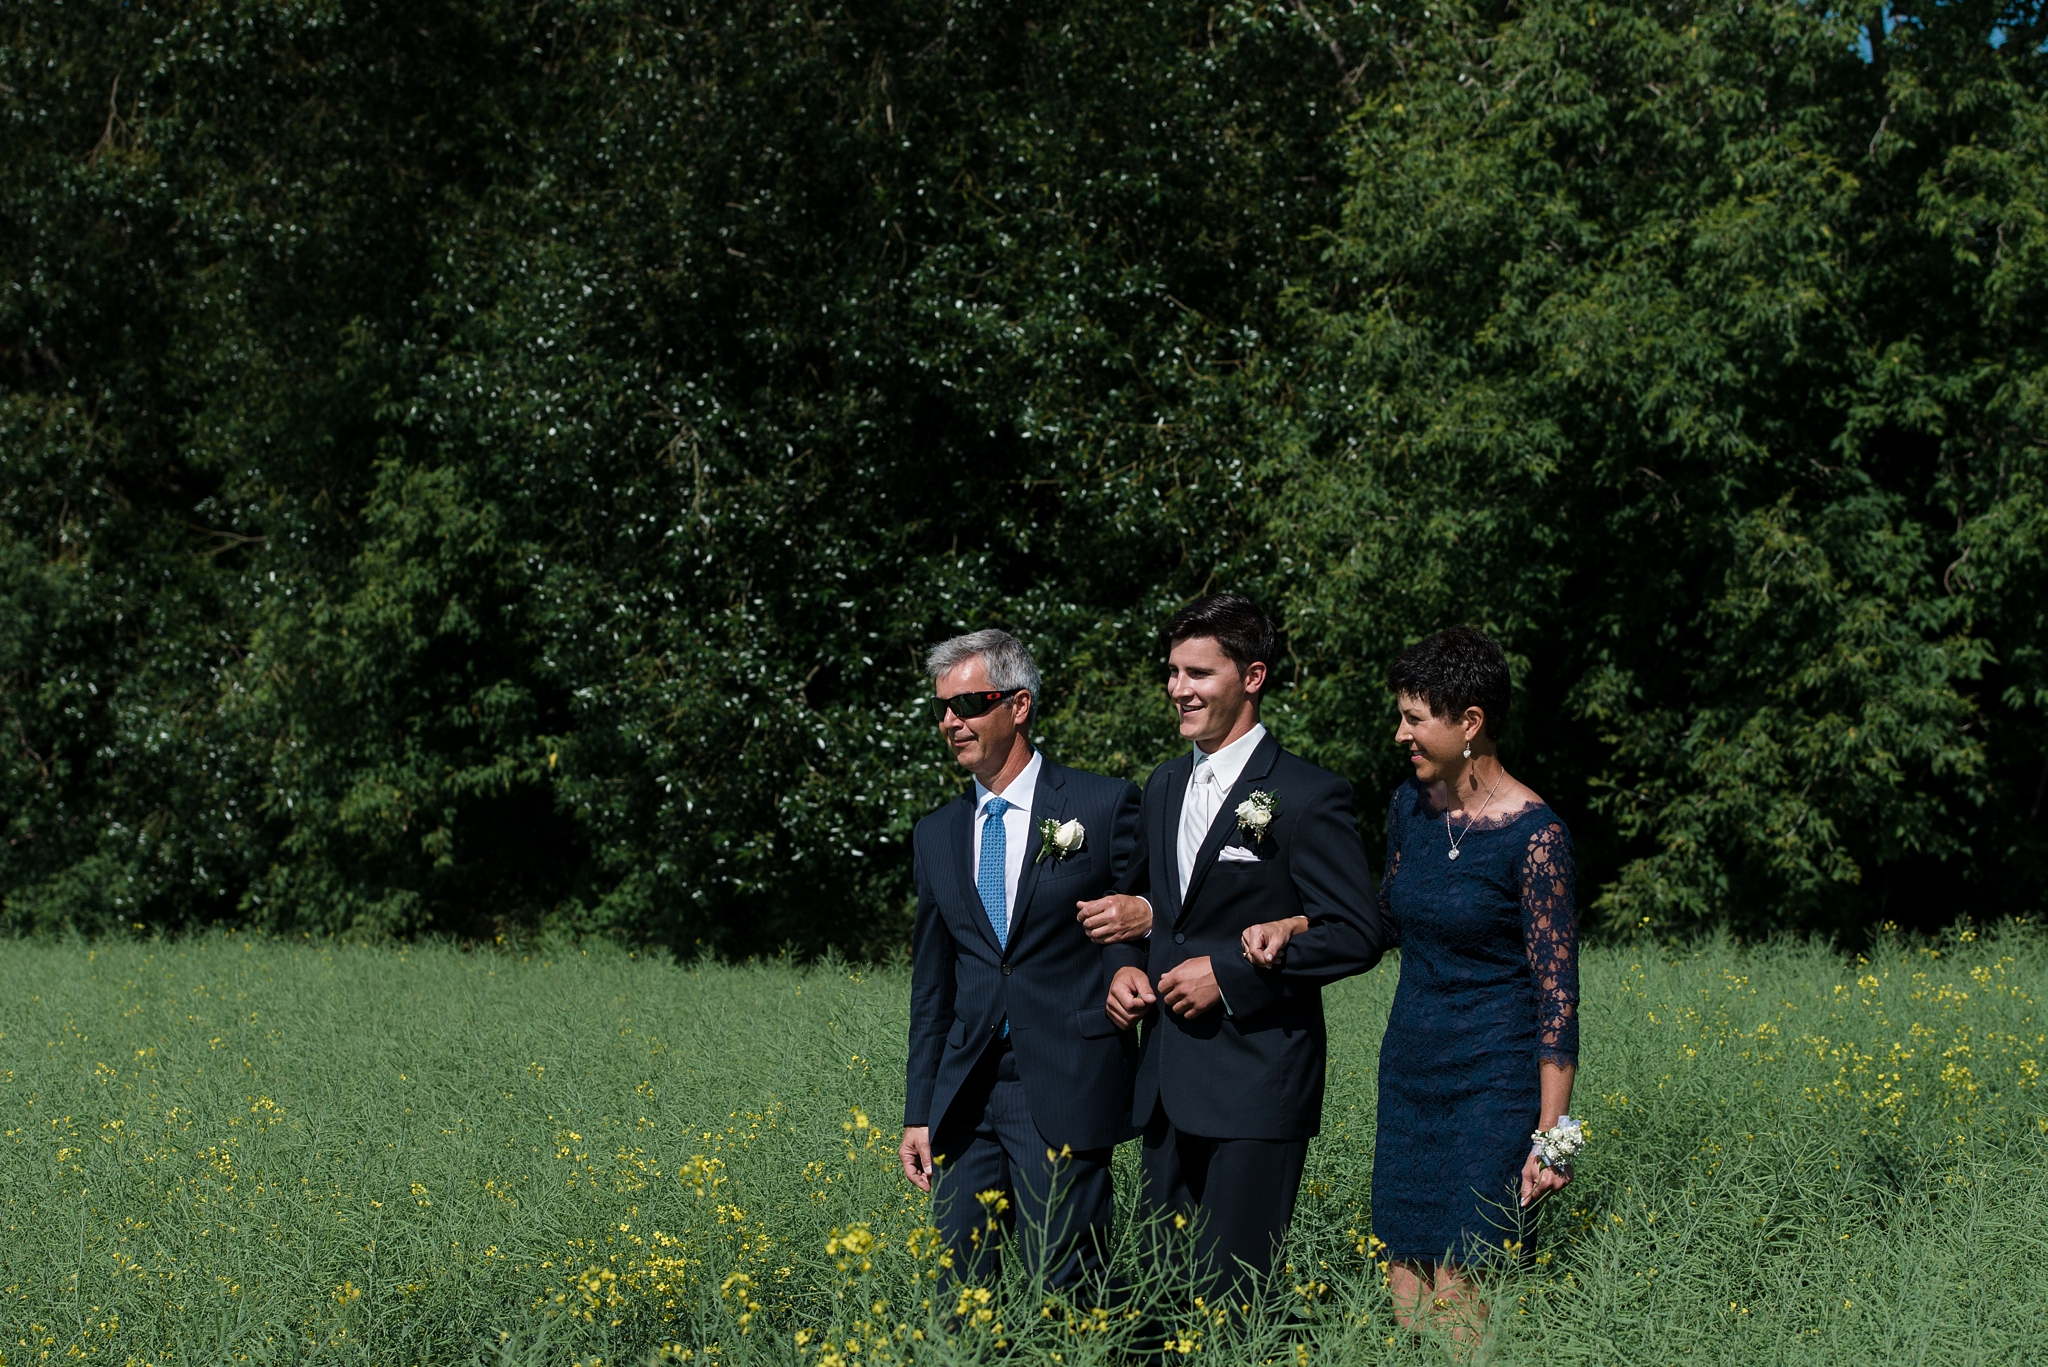 kaihla_tonai_intimate_wedding_elopement_photographer_0044